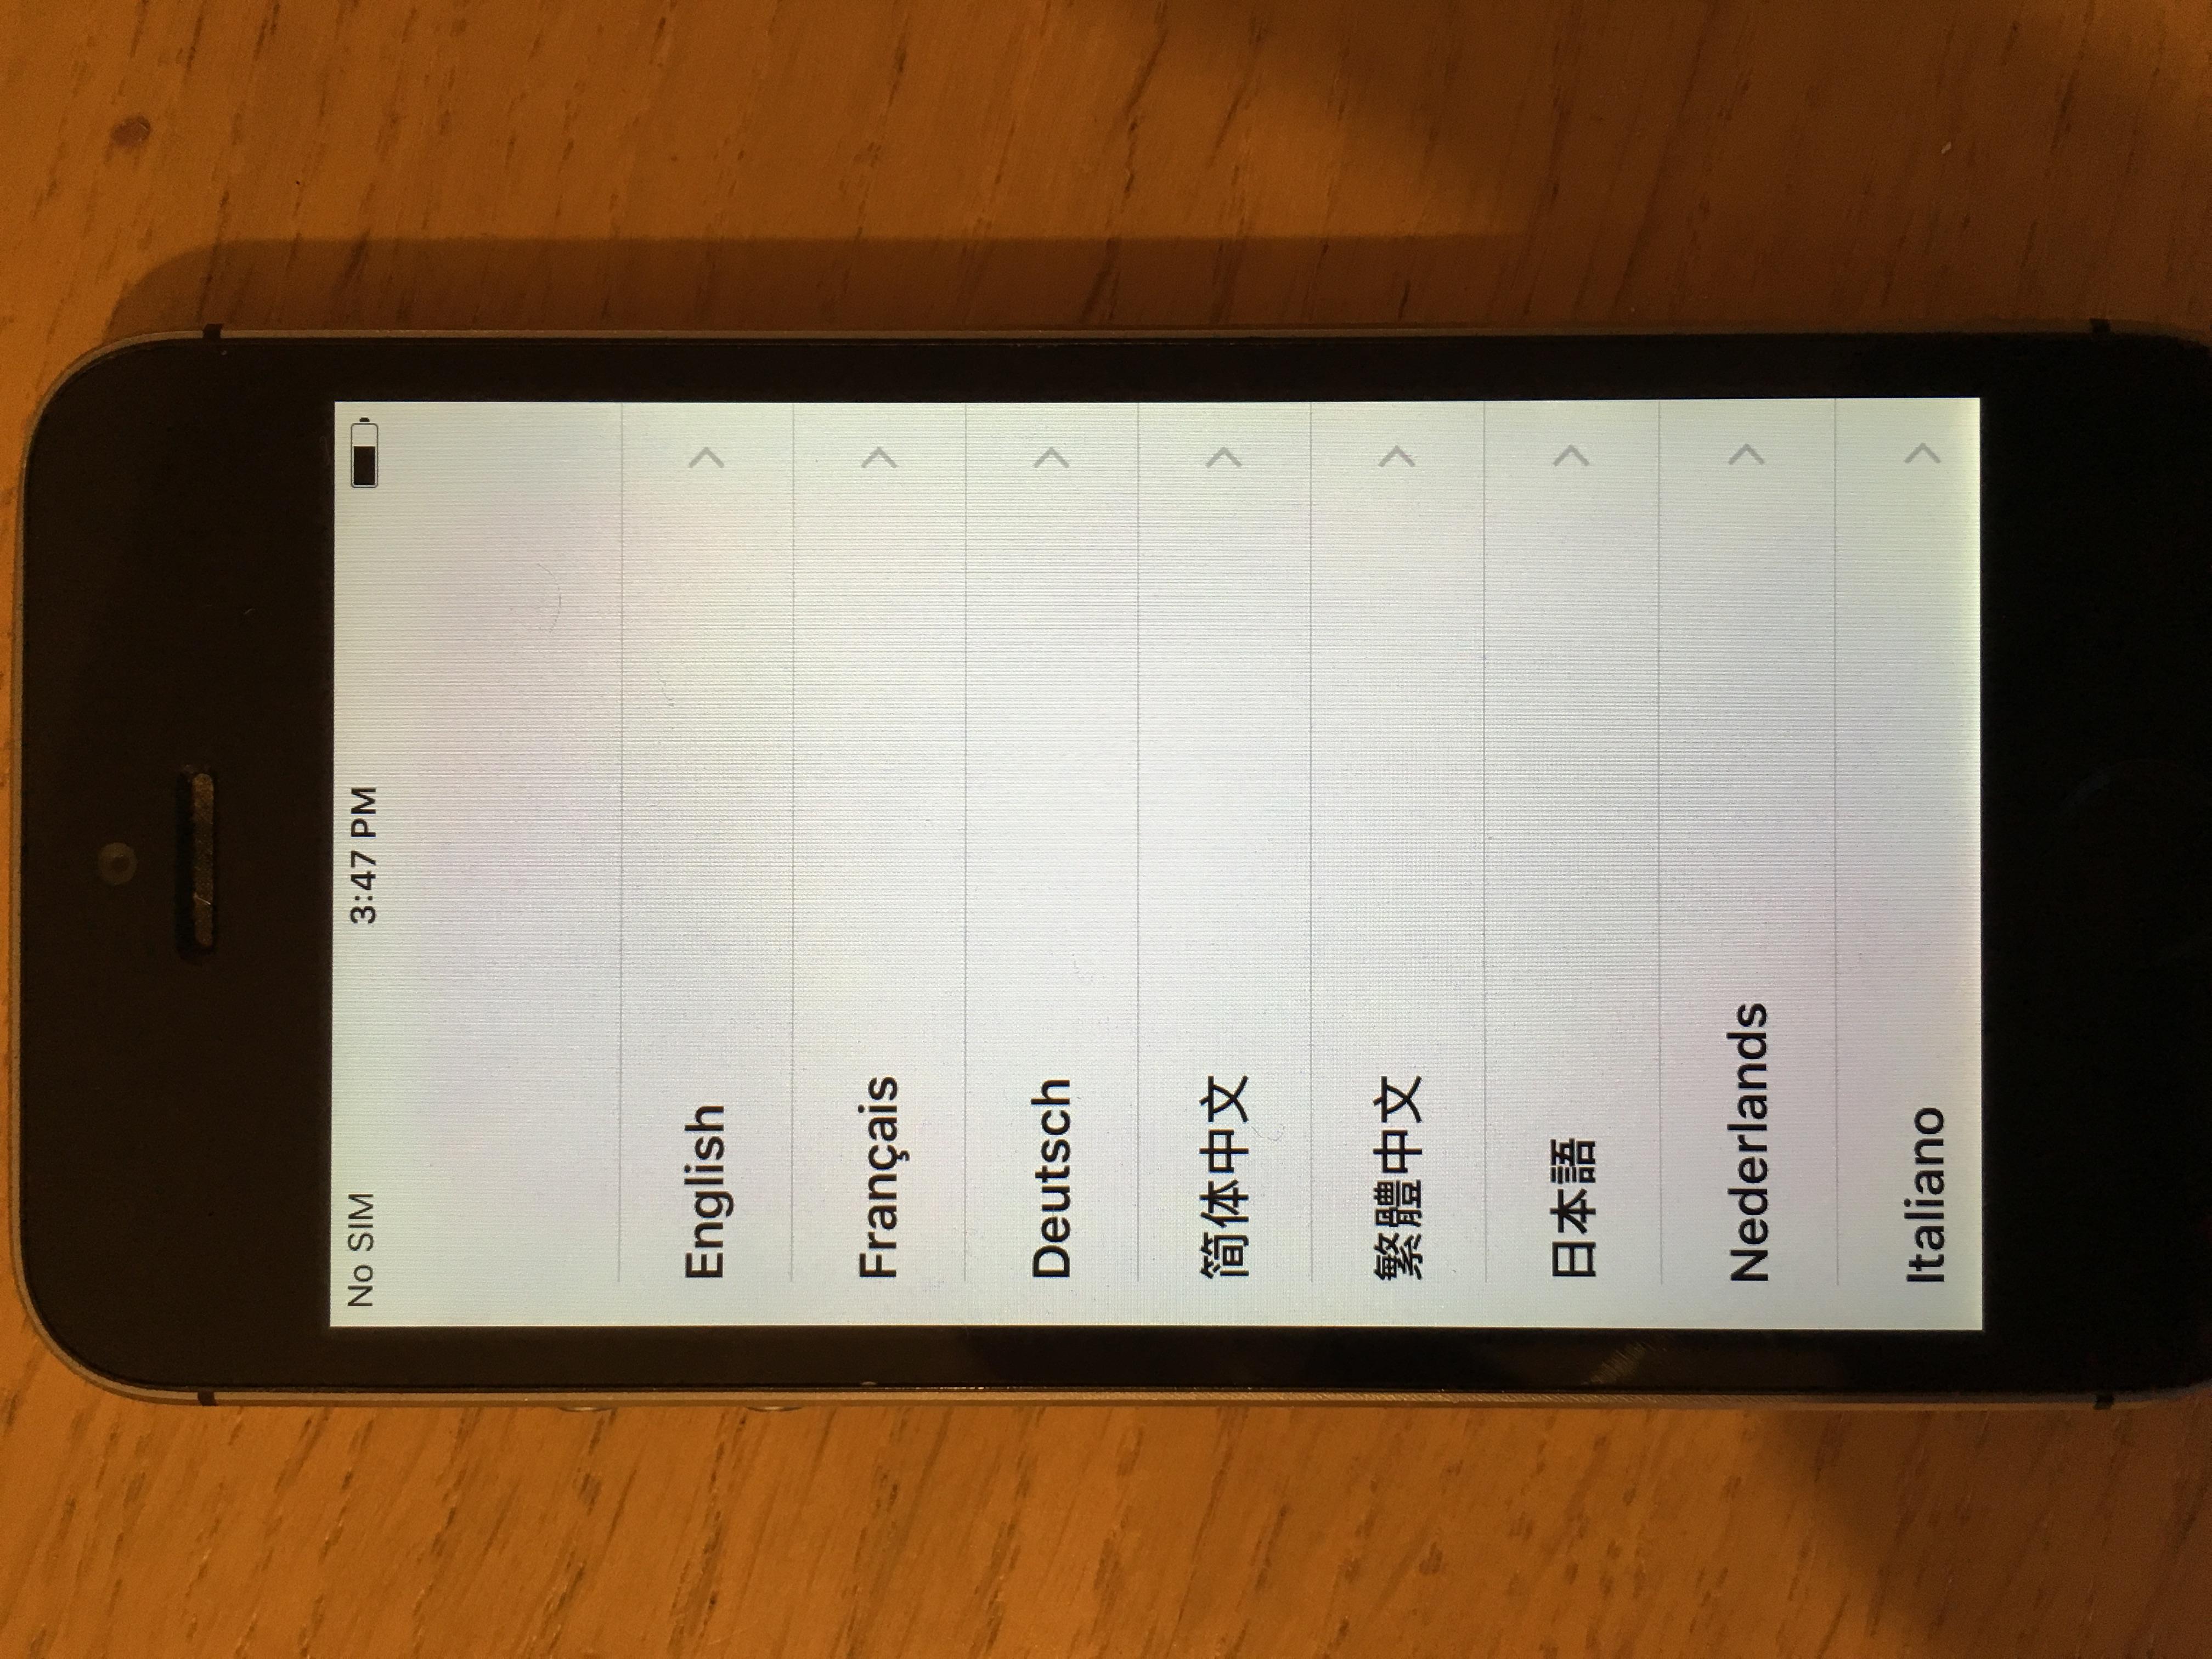 Iphone S Lcd Screen